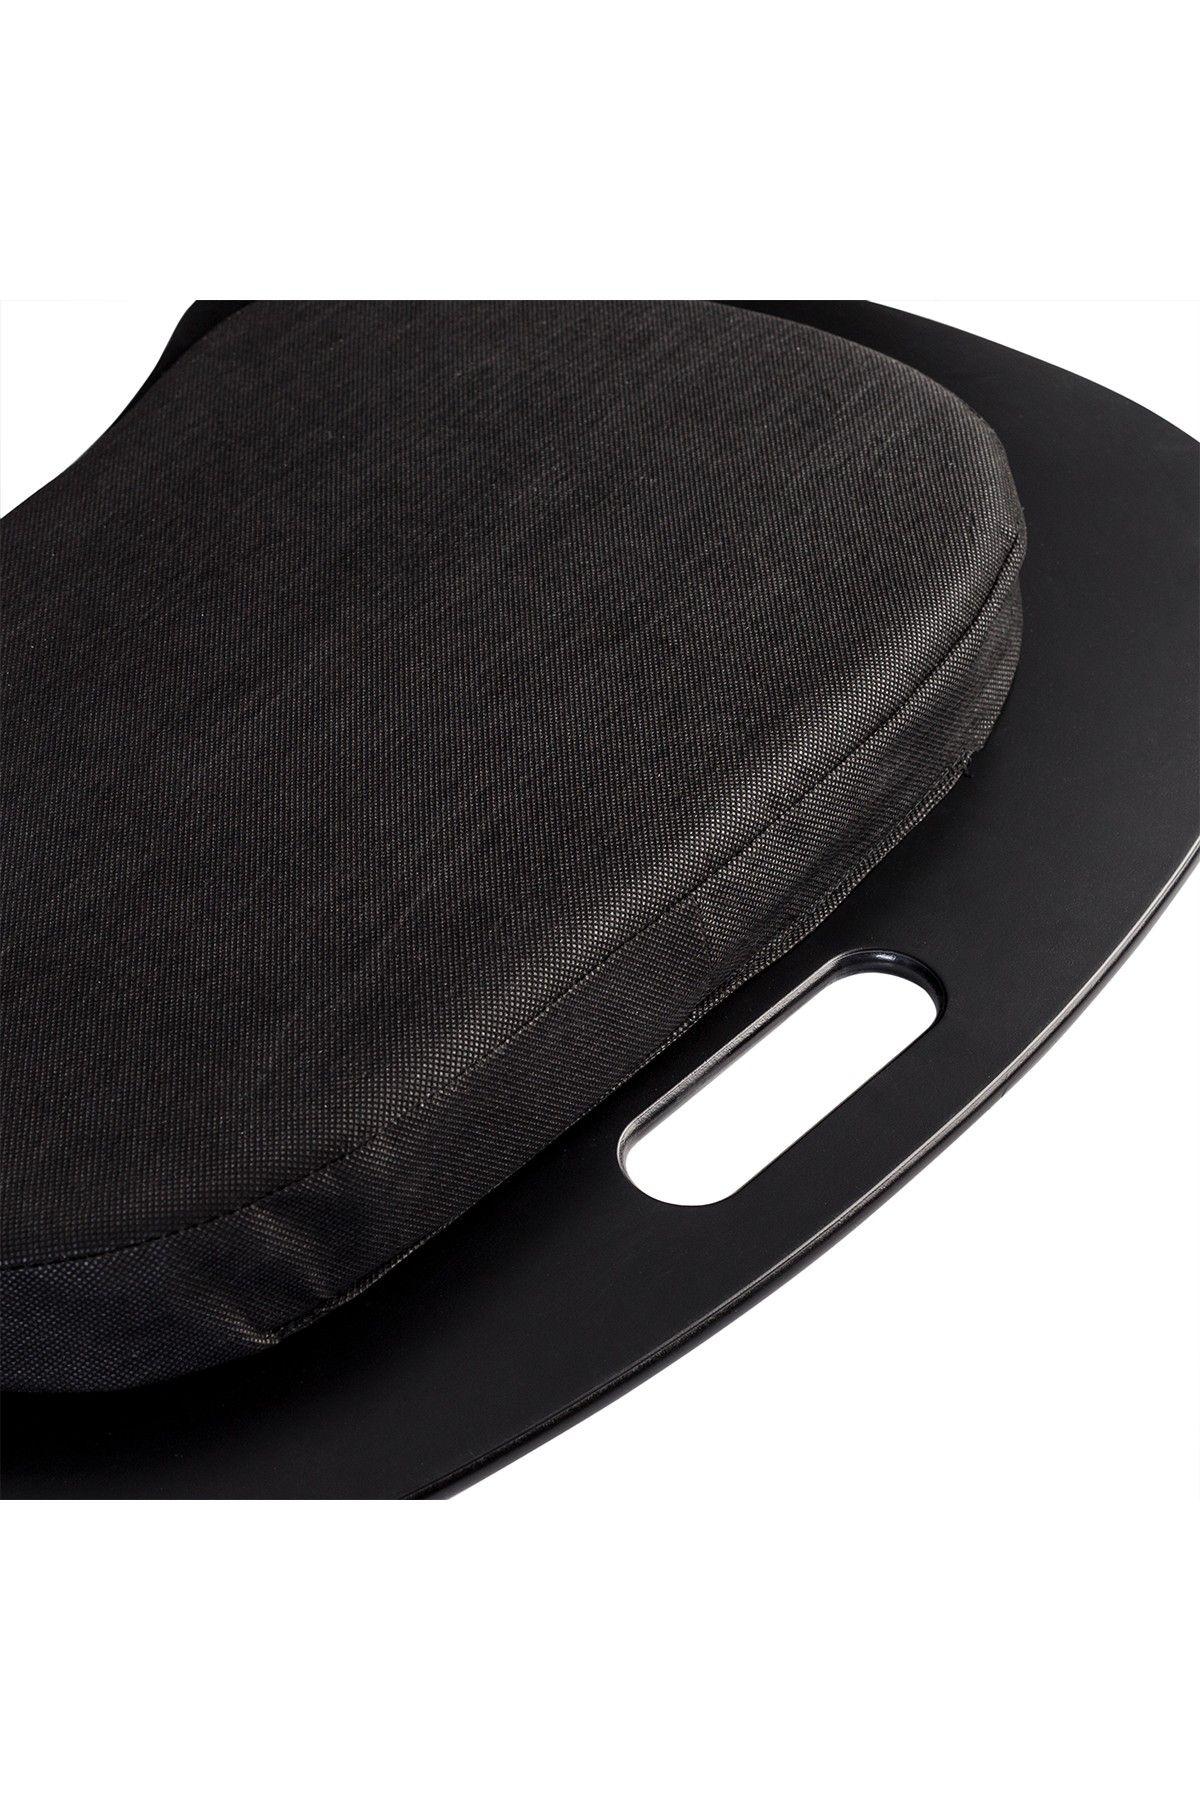 Honey Can Do Black Portable Lap Desk Sponsored Sponsored Black Honey Portable Desk Fashion Casual Jacket Street Style